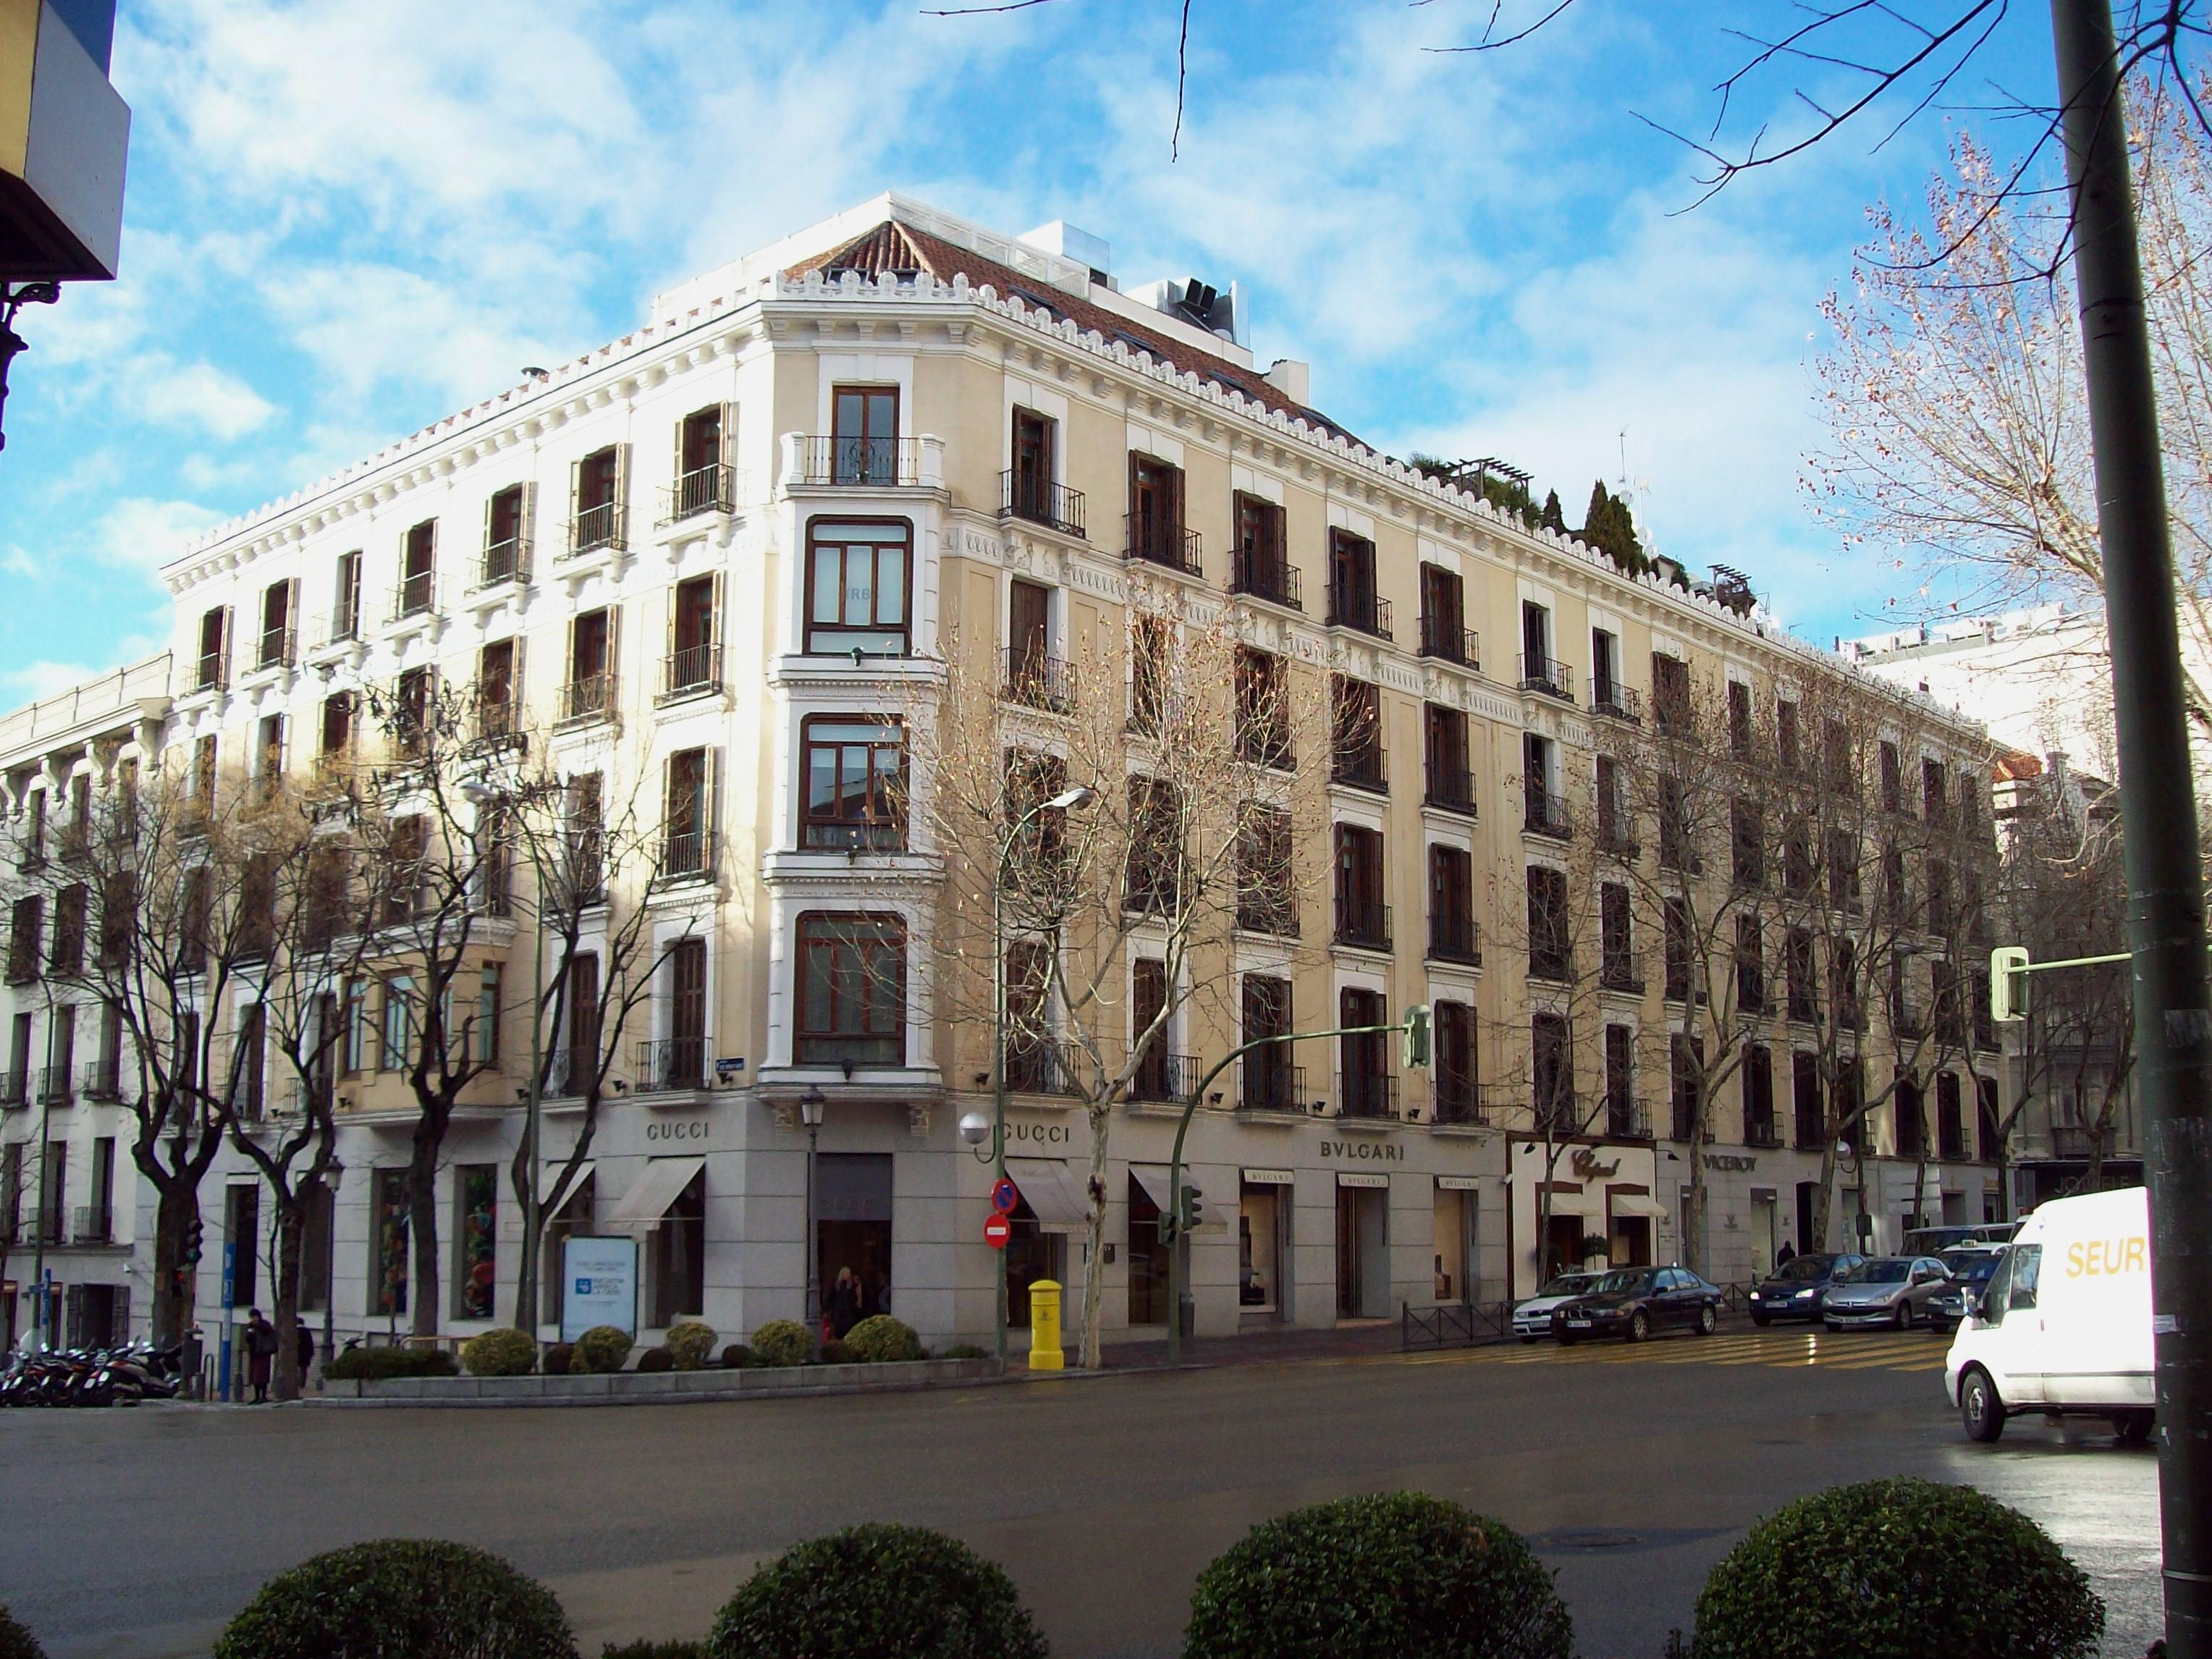 File Serrano 49 51 Madrid 01 Jpg Wikimedia Commons